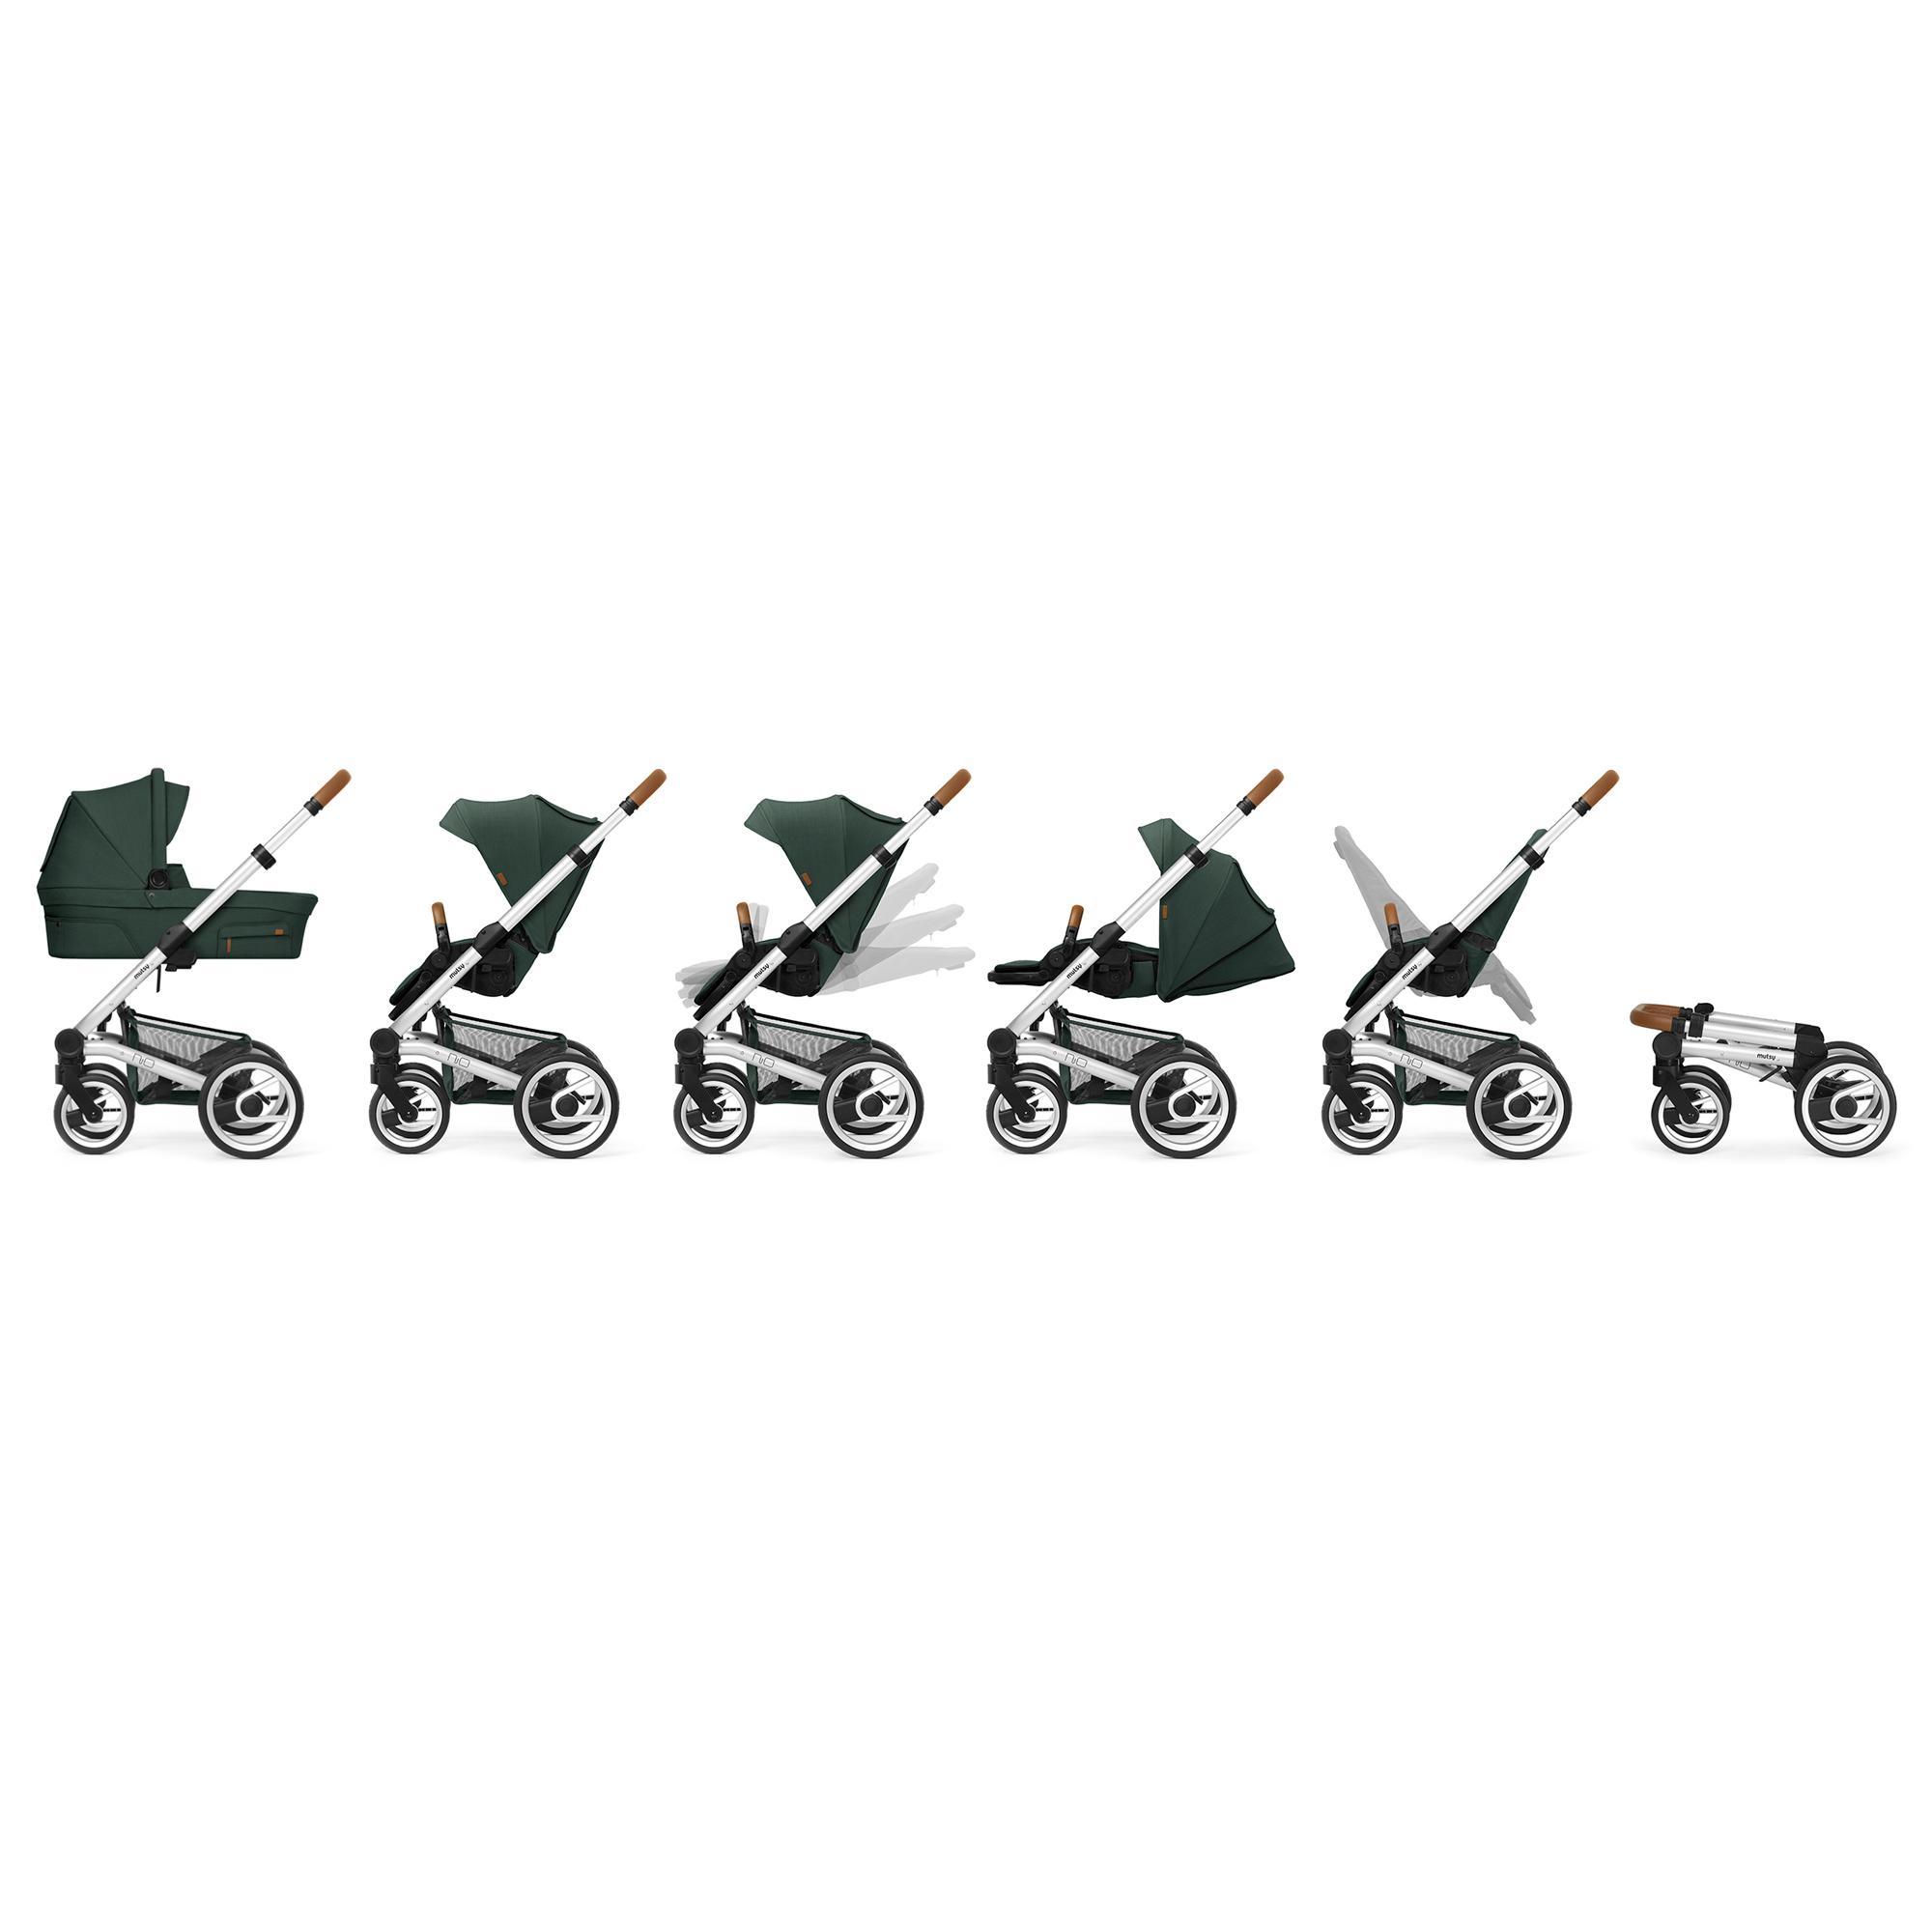 Пакет Шаси Mutsy Nio Black + Кош за новородено и Седалка със сенник Mutsy Nio Adventure Sea Green